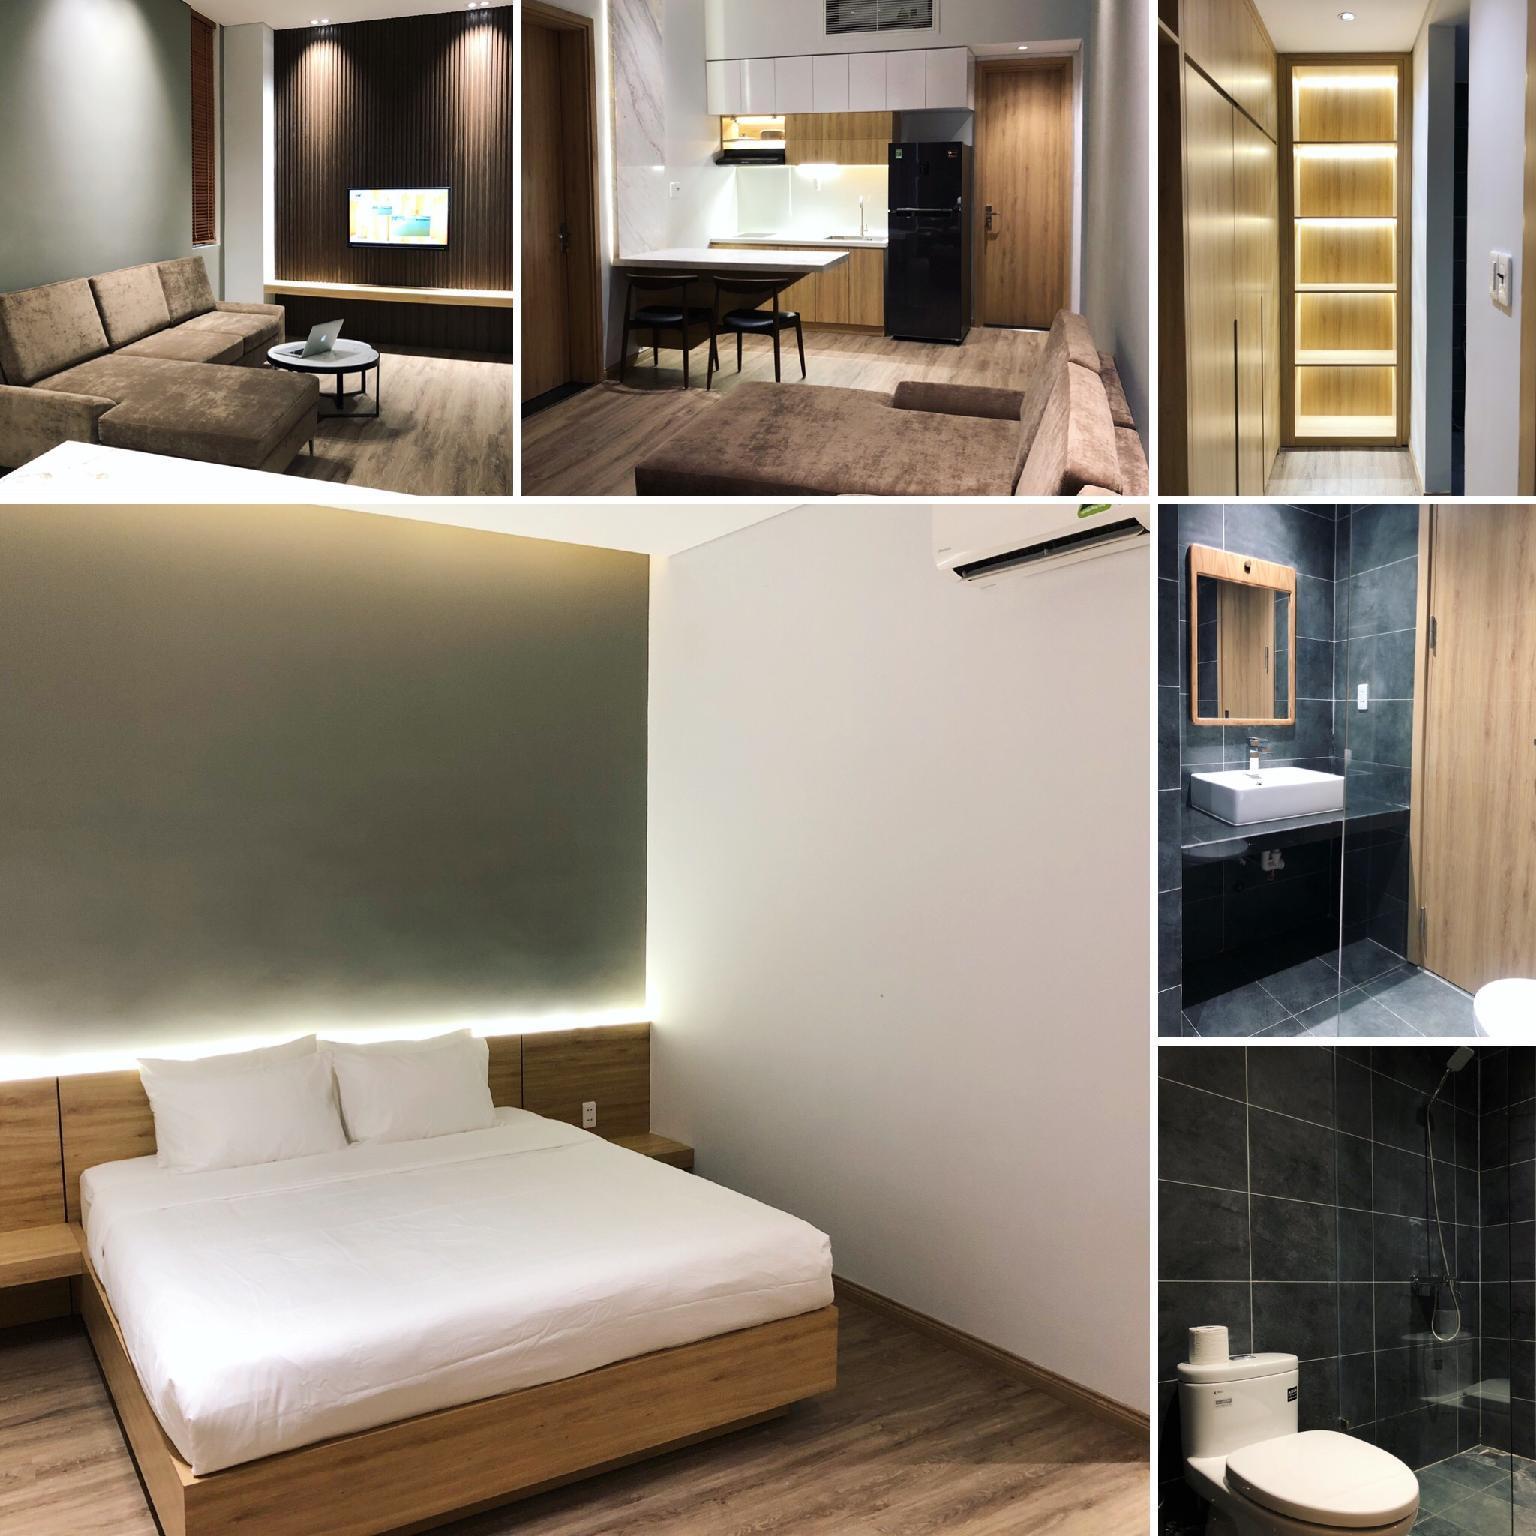 Khe Suites City Center 01Bedroom